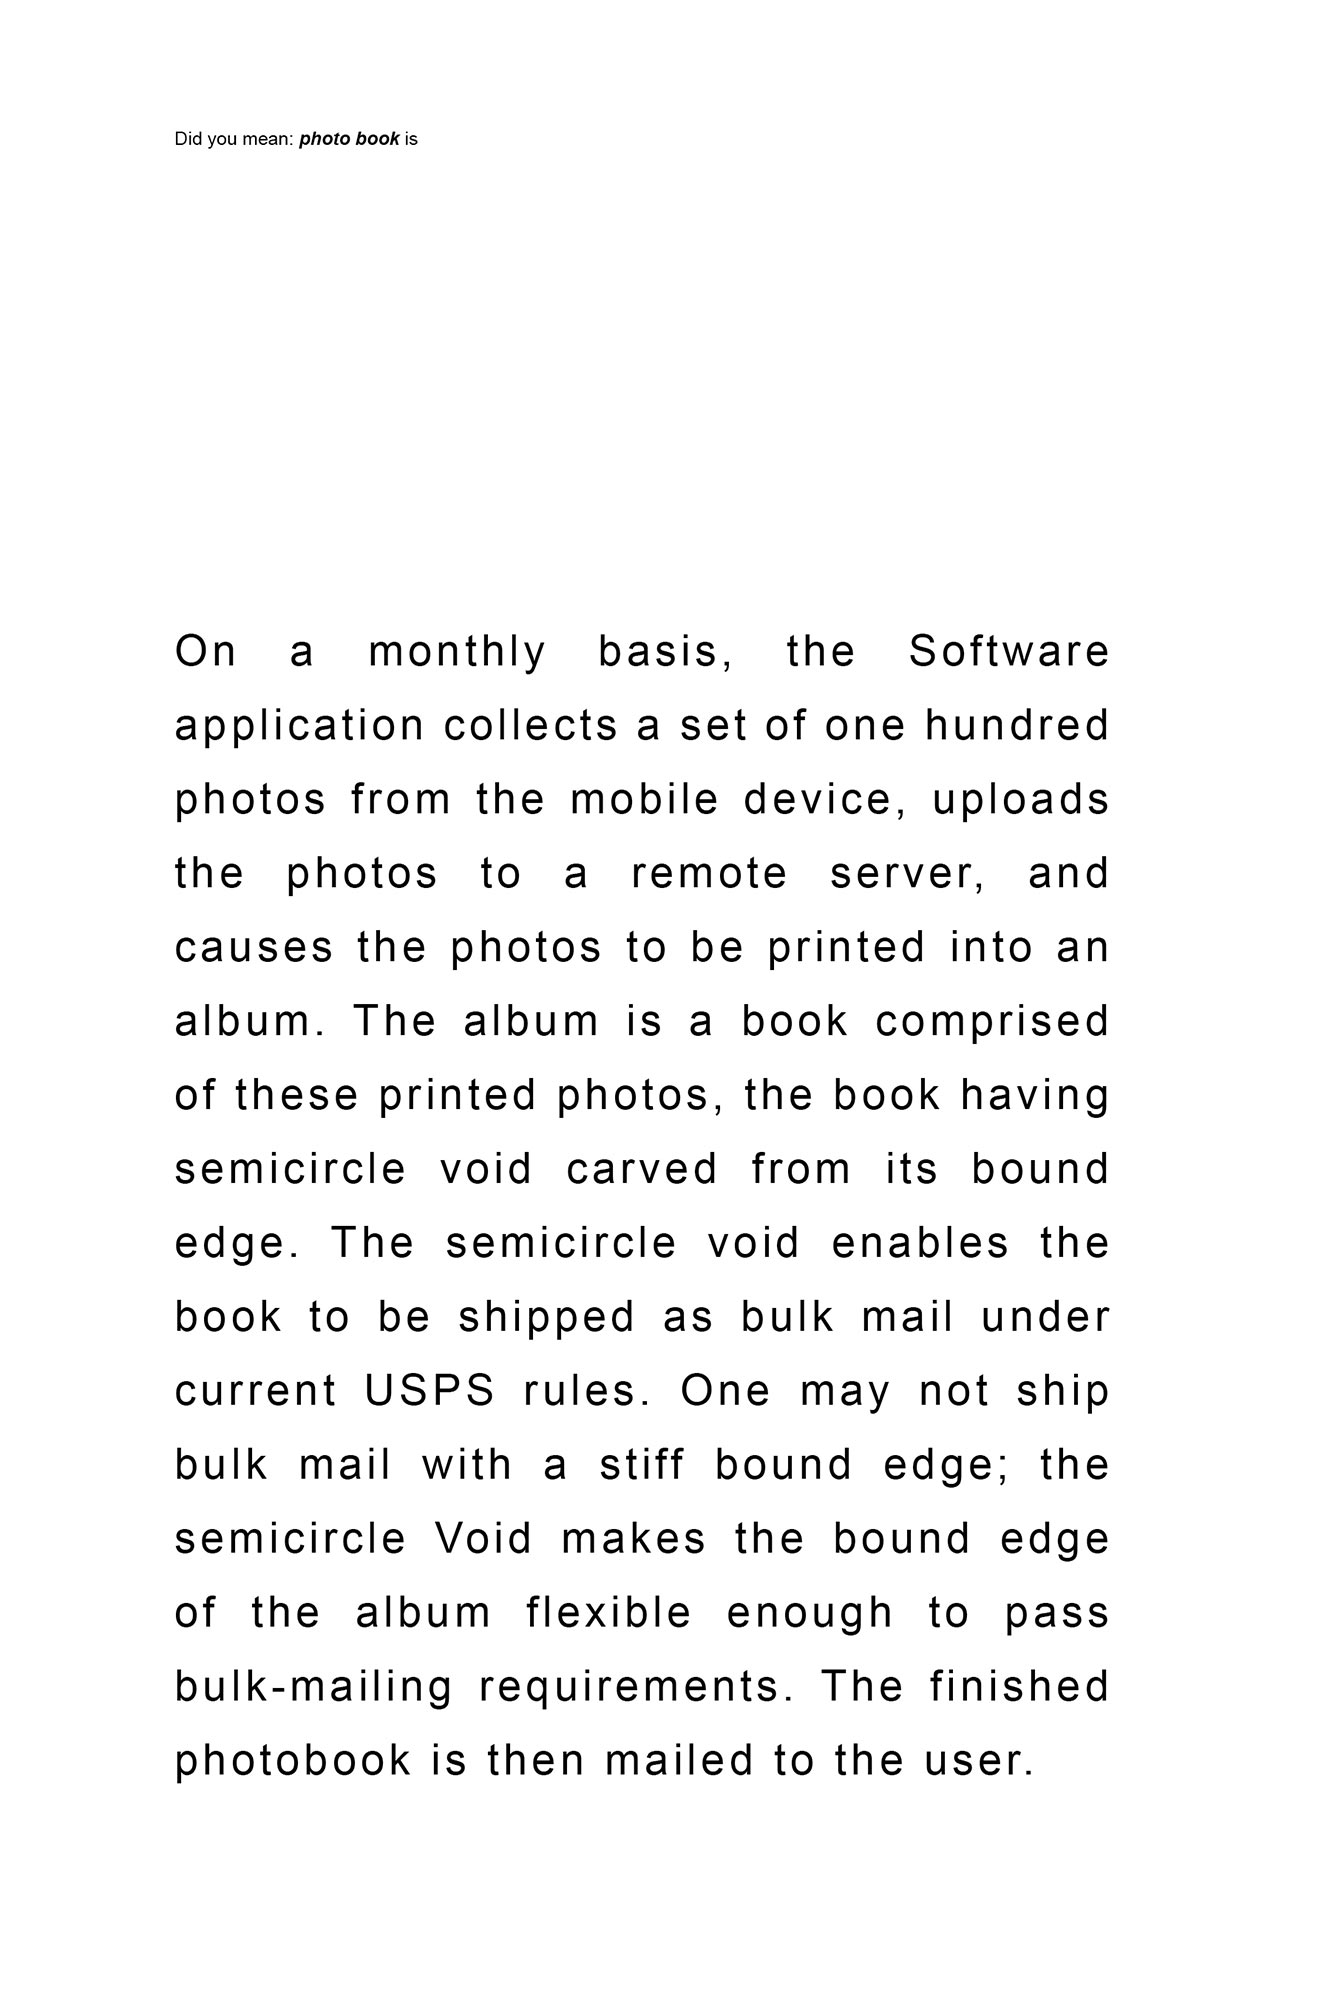 msdm-photobook-is-p33